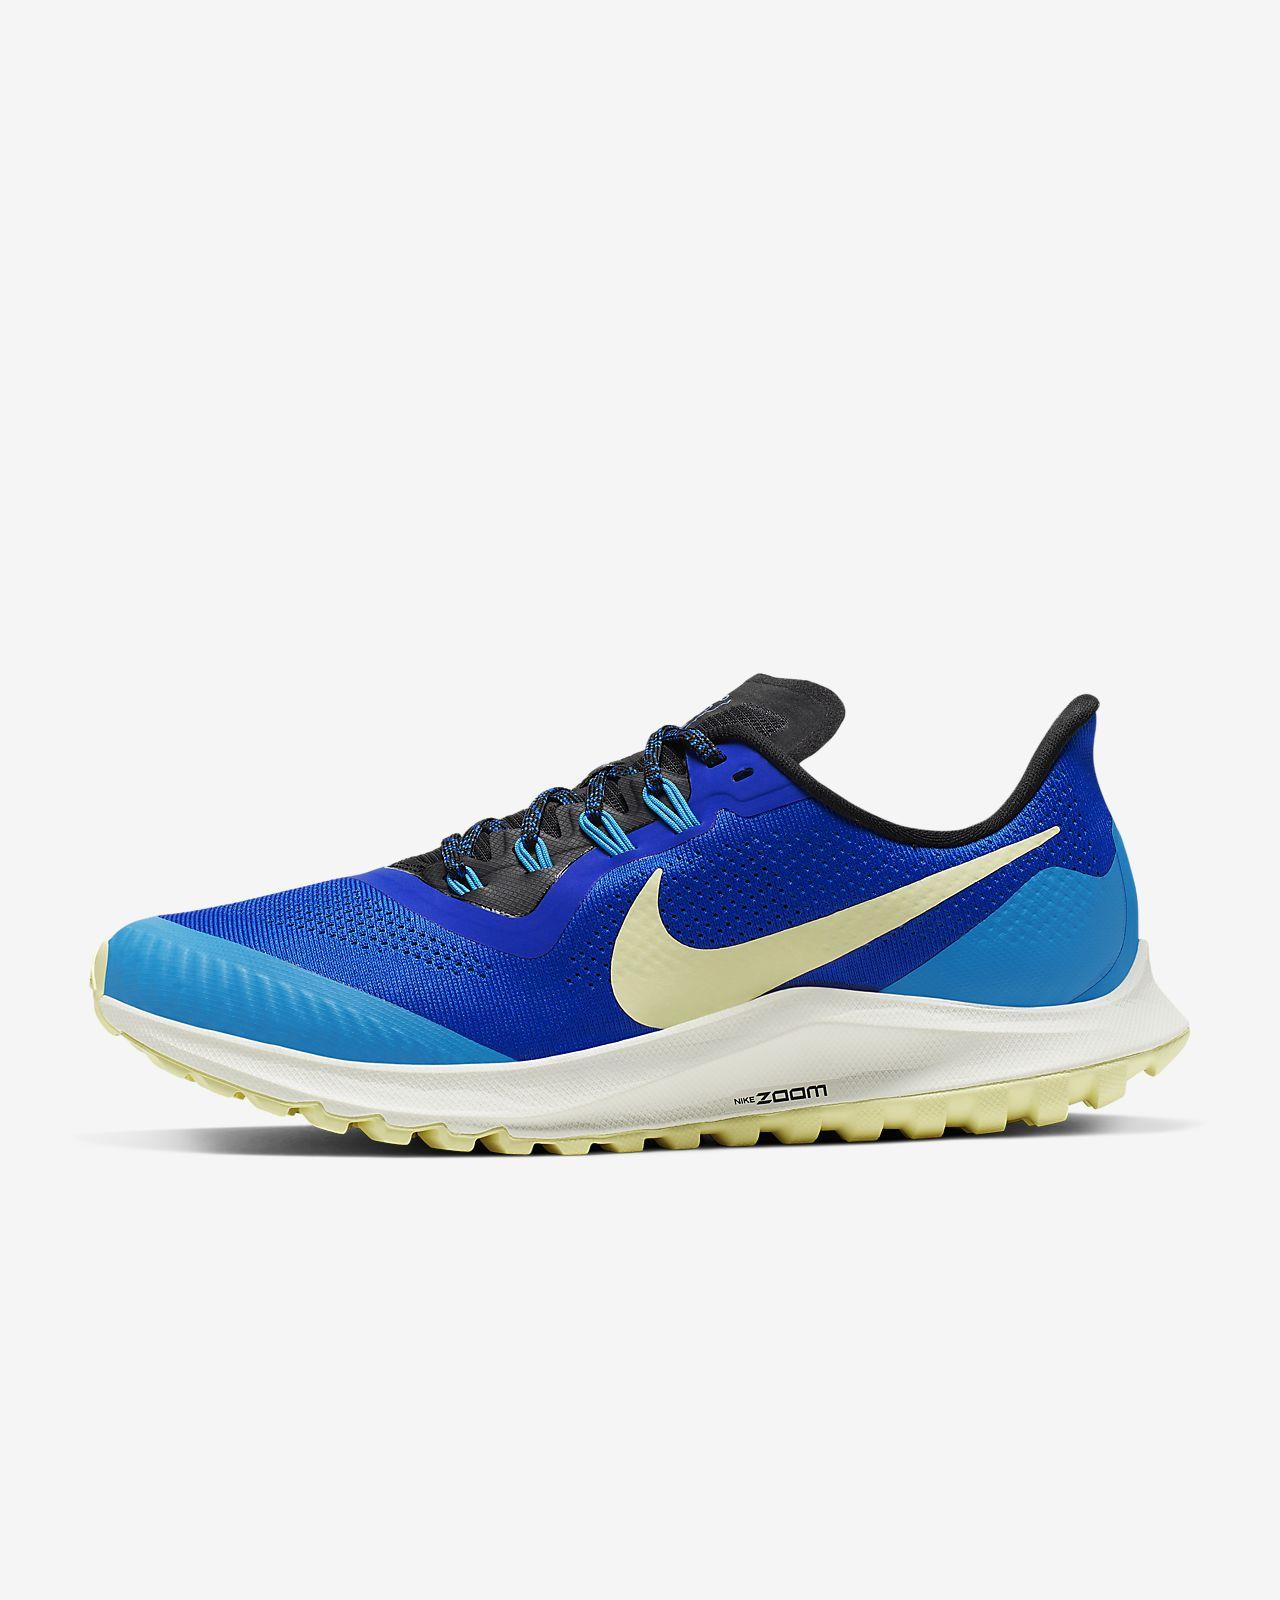 Sapatilhas de running Nike Air Zoom Pegasus 36 Trail para homem